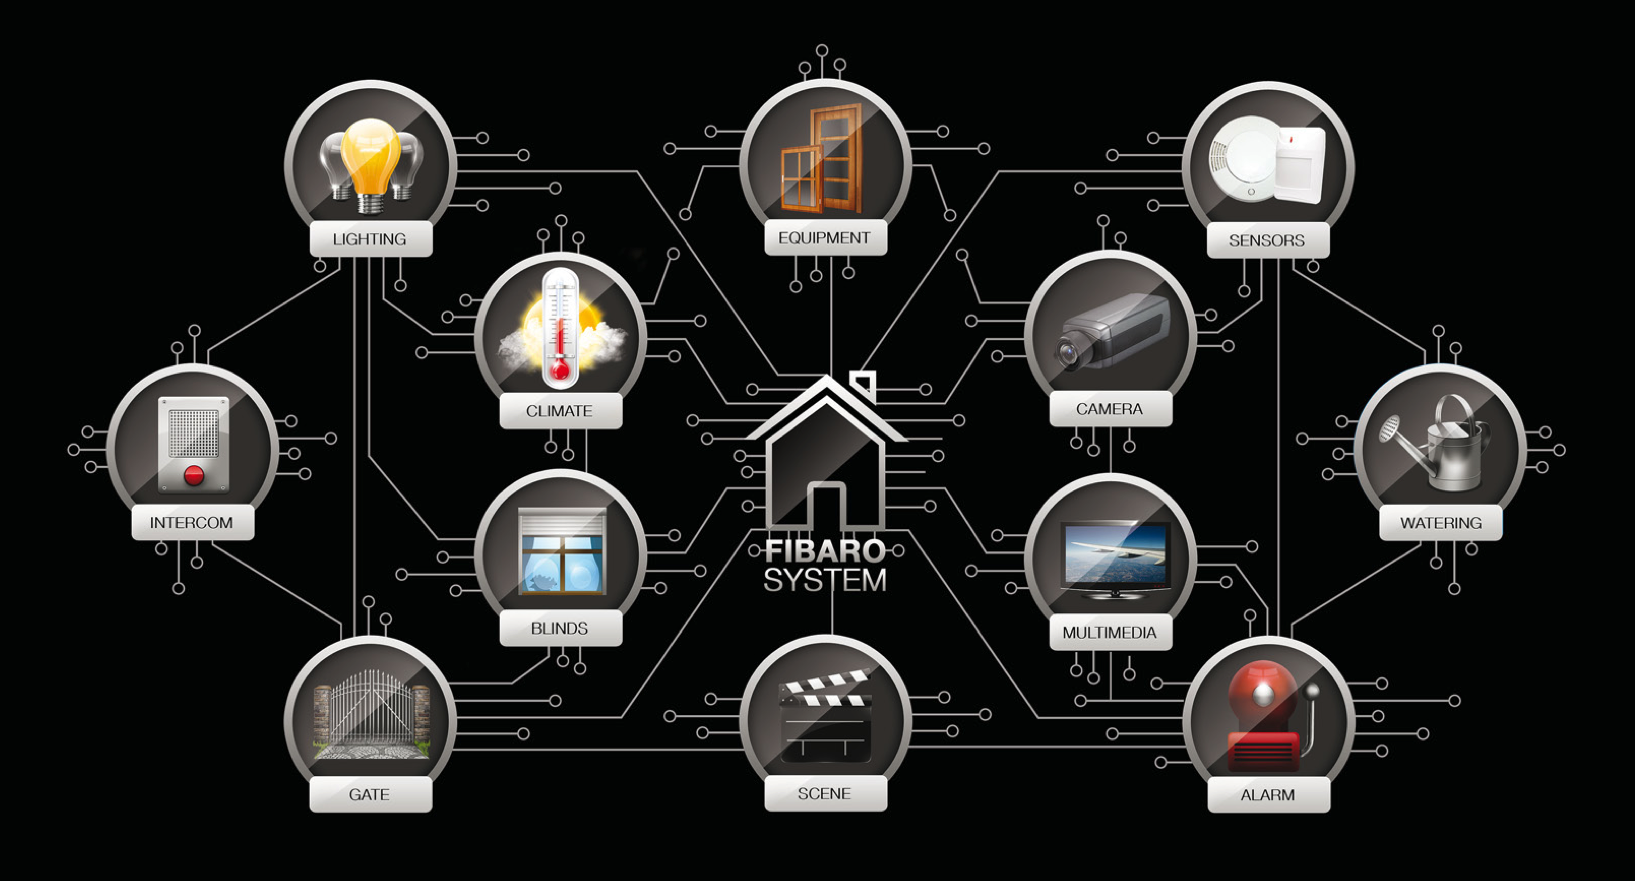 FIBARO Network | Z-Wave | Pinterest